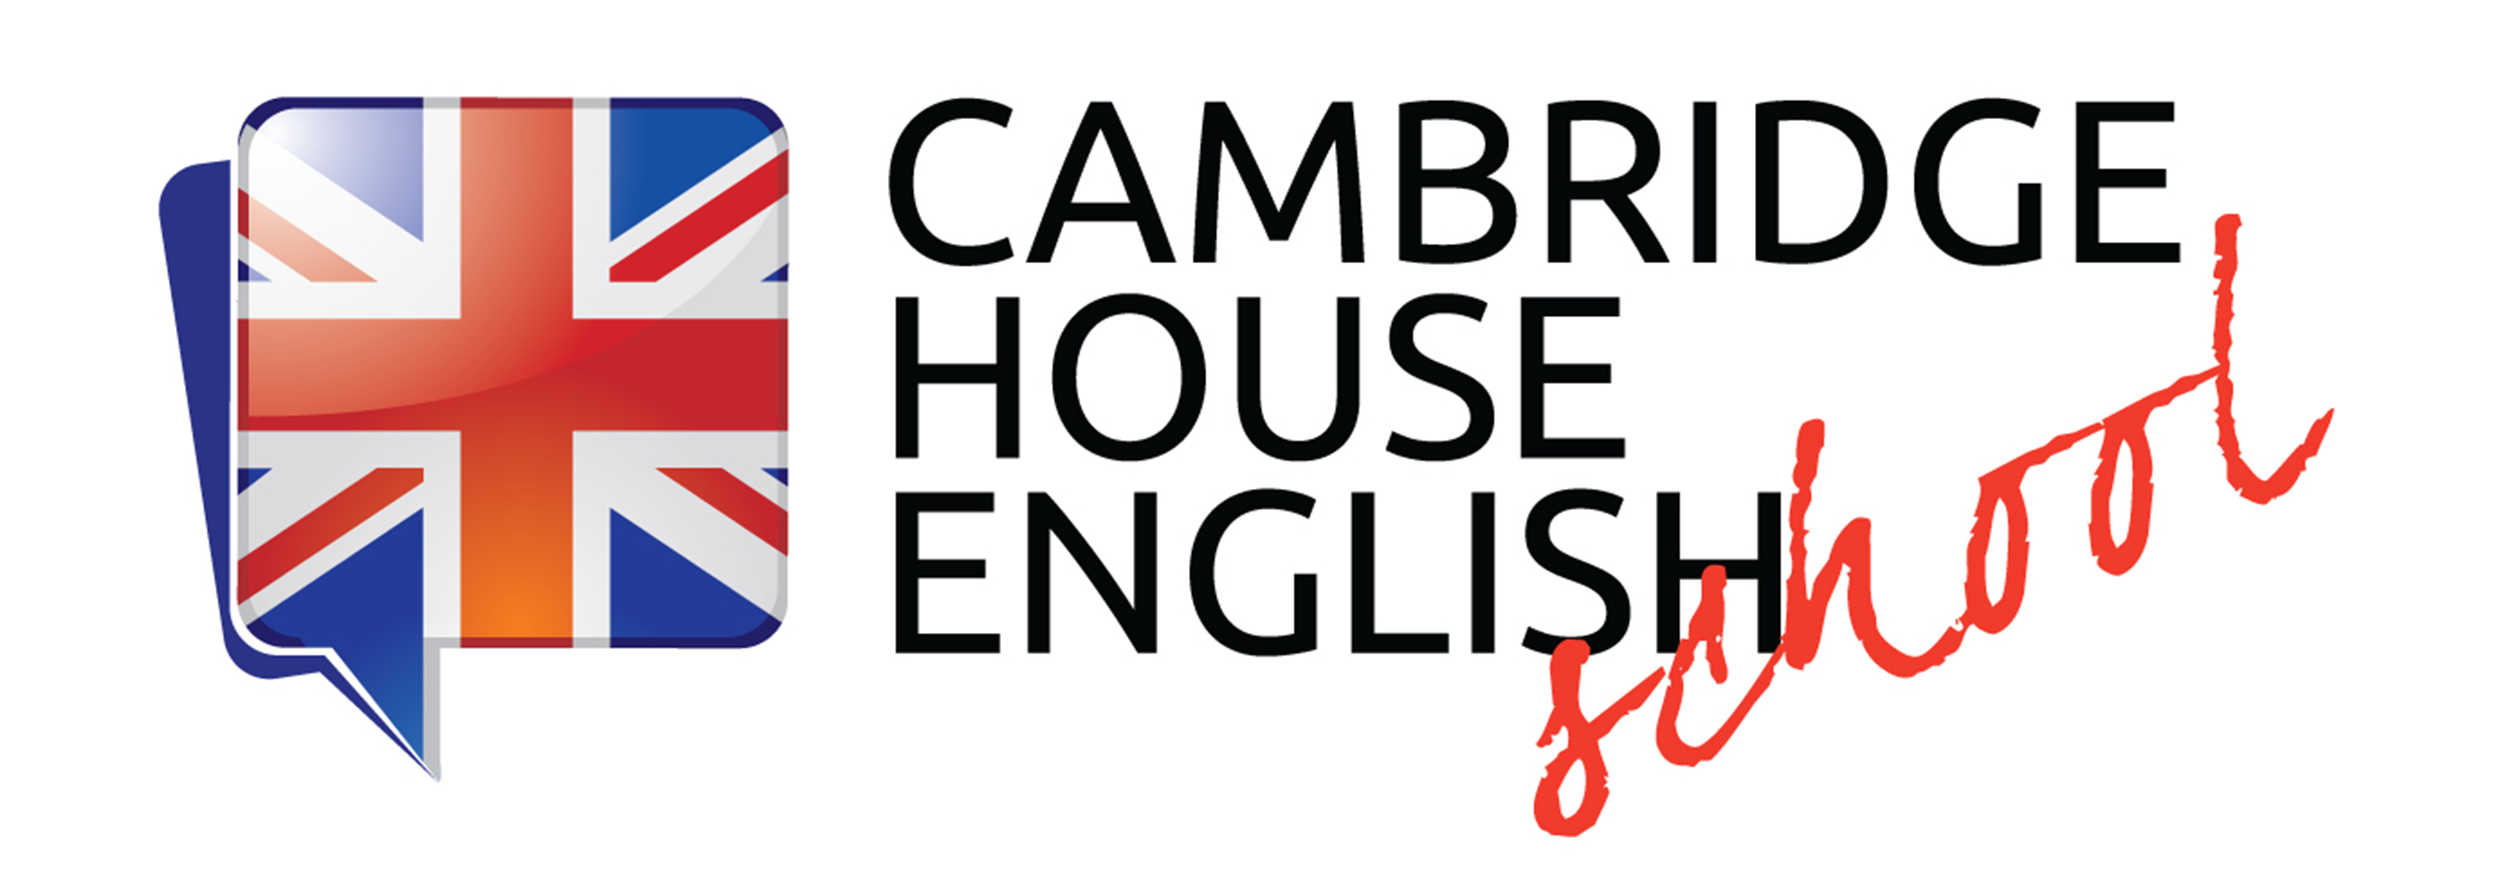 Cambridge House English